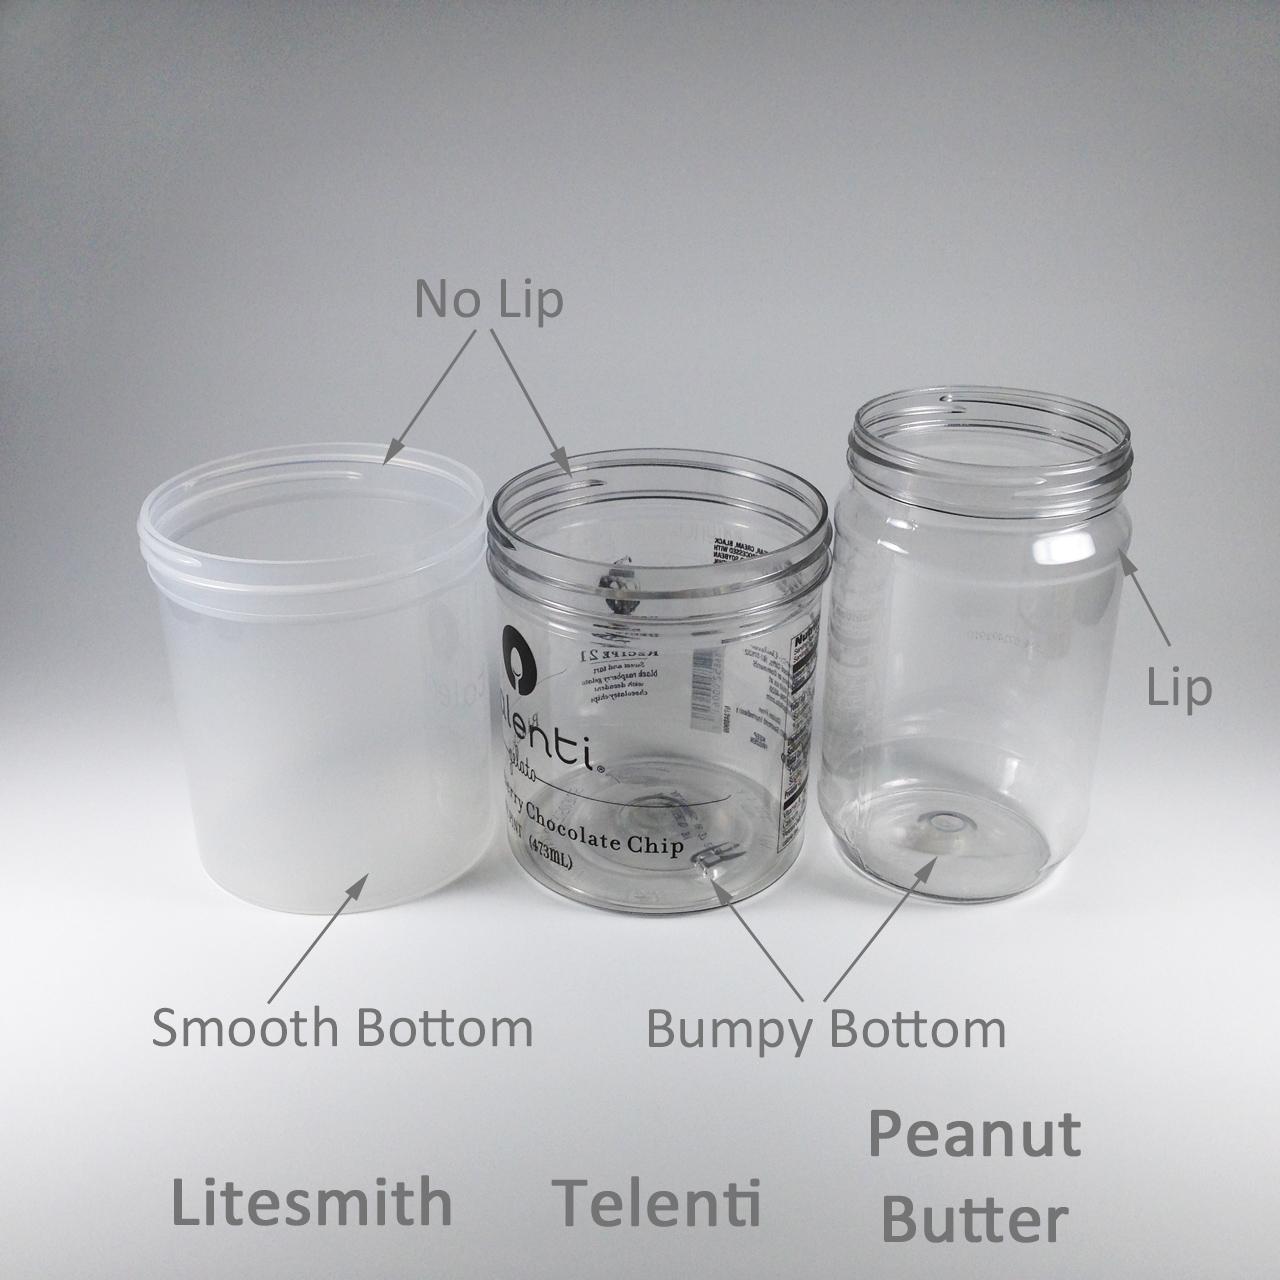 cold-soaking-jars-comparison.jpg